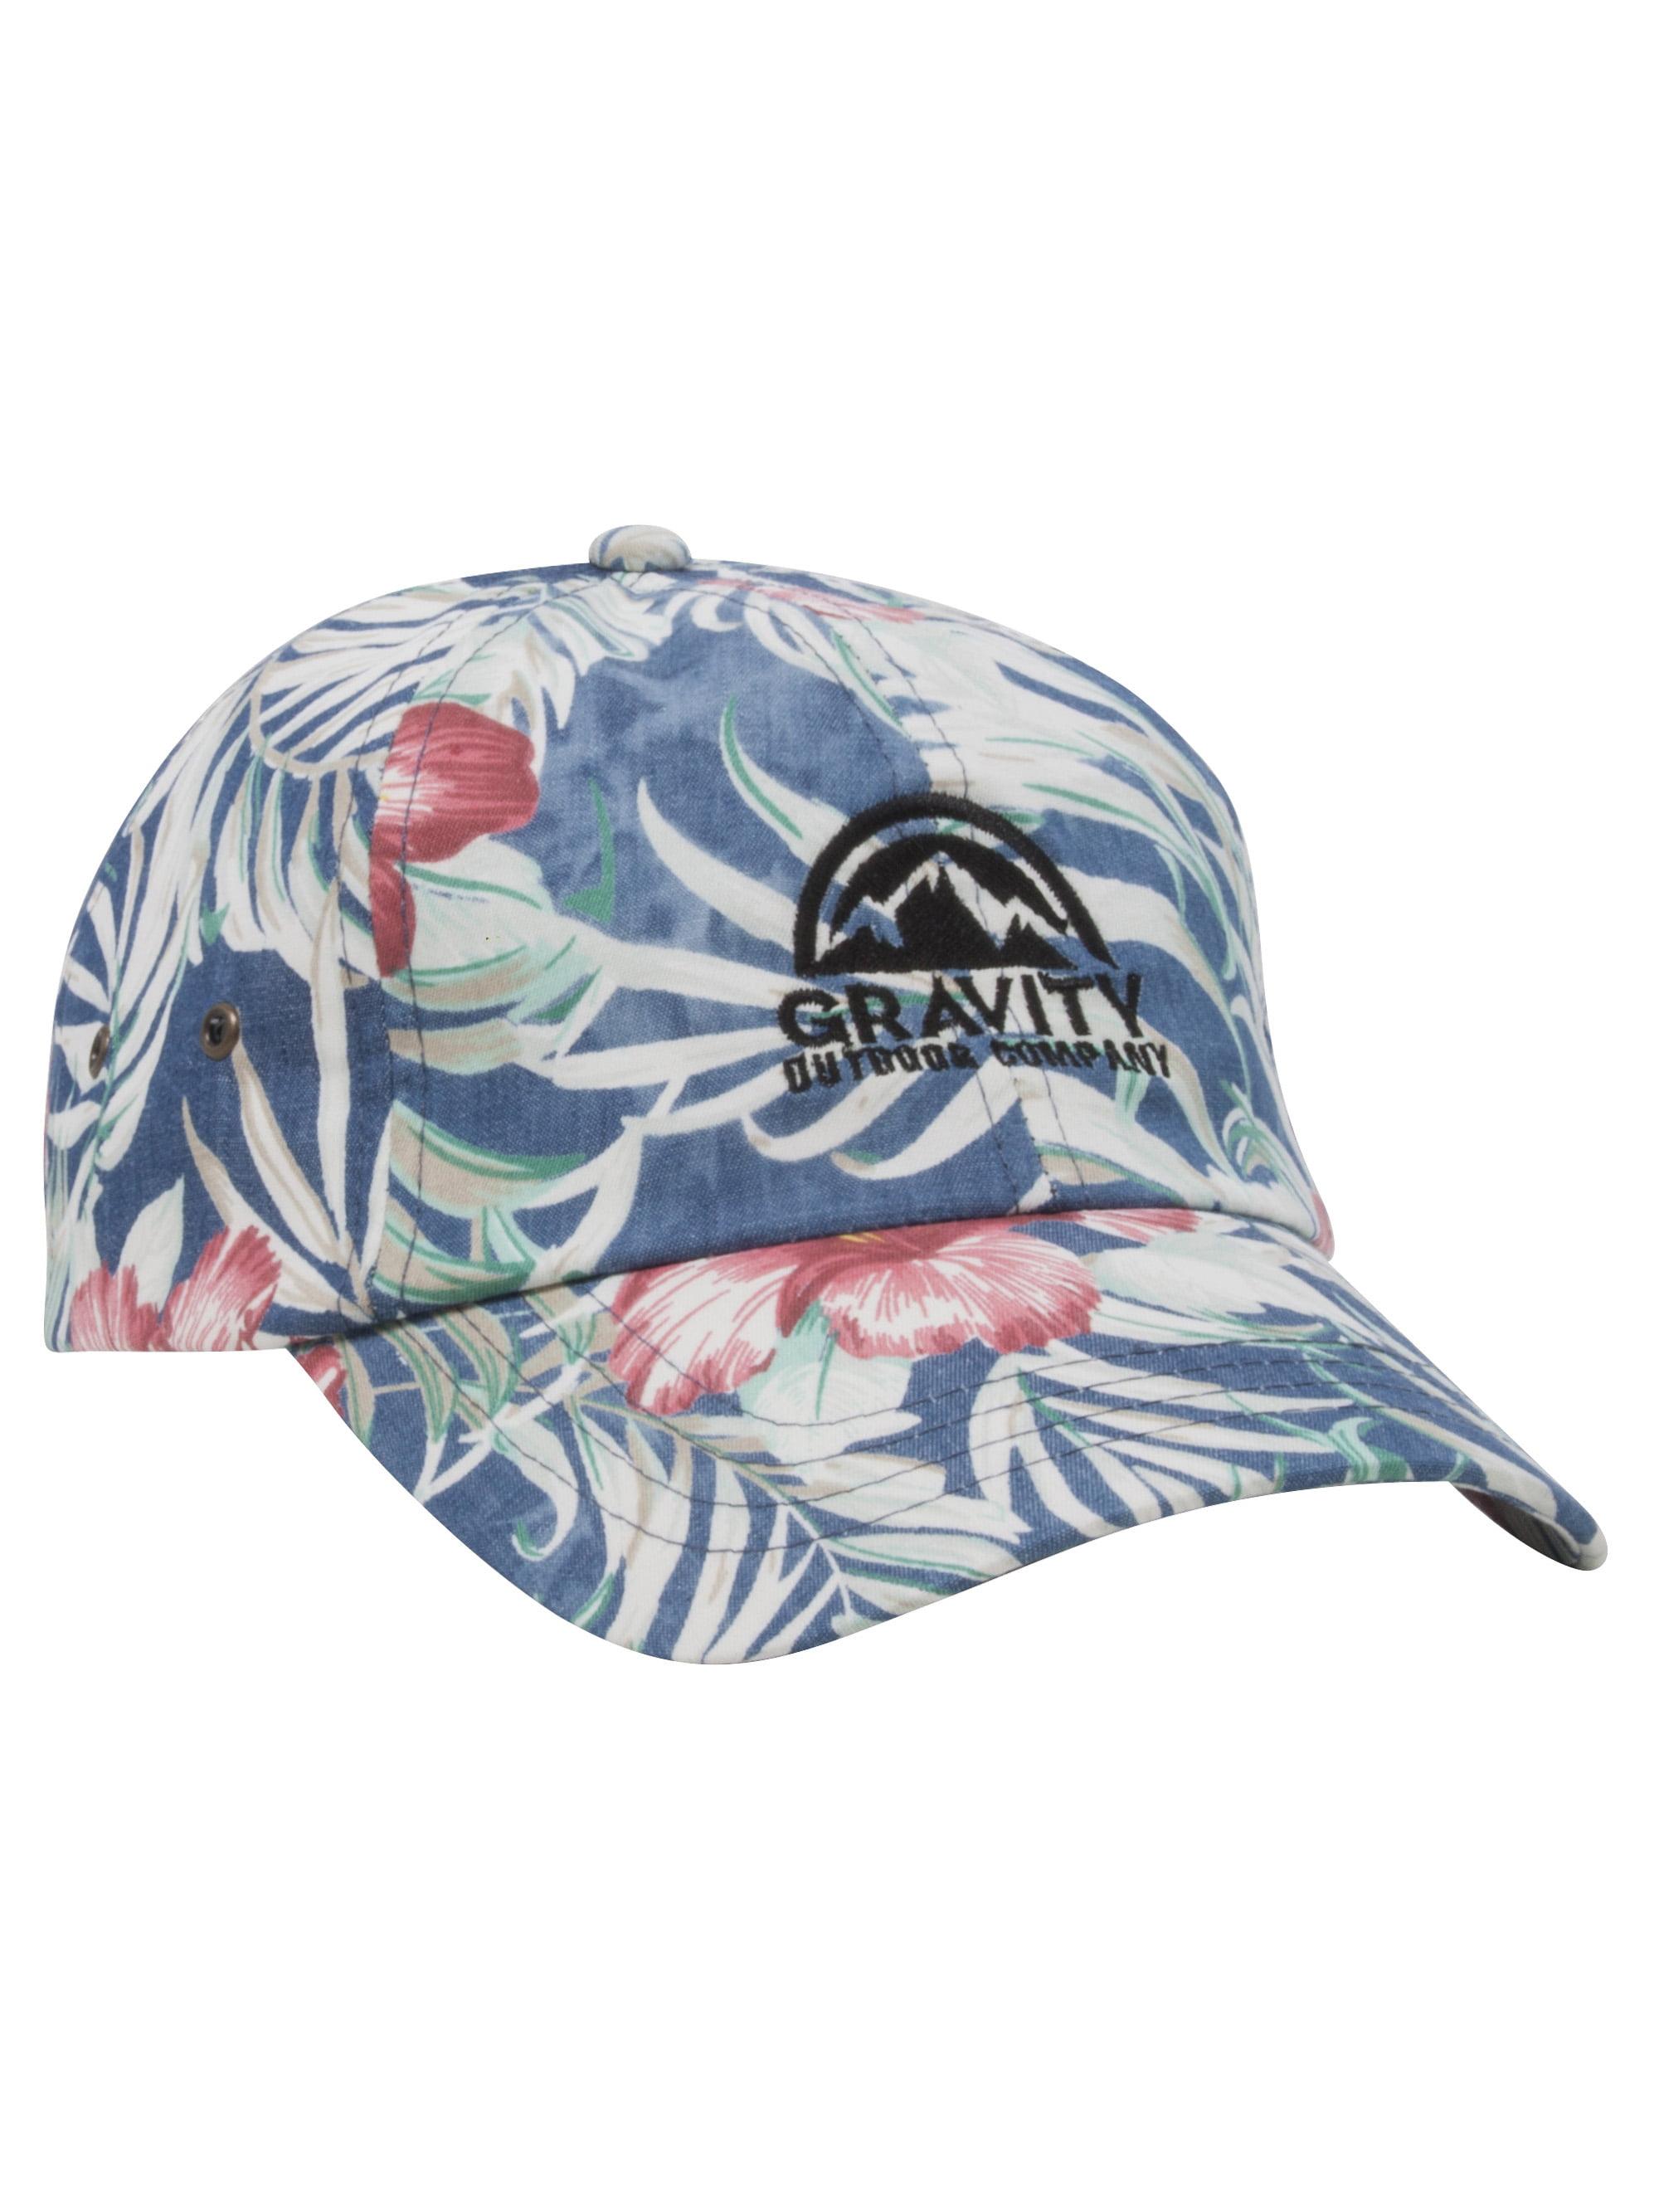 db8bd8697ee Gravity Outdoor Co. Floral Print Adjustable Baseball Cap